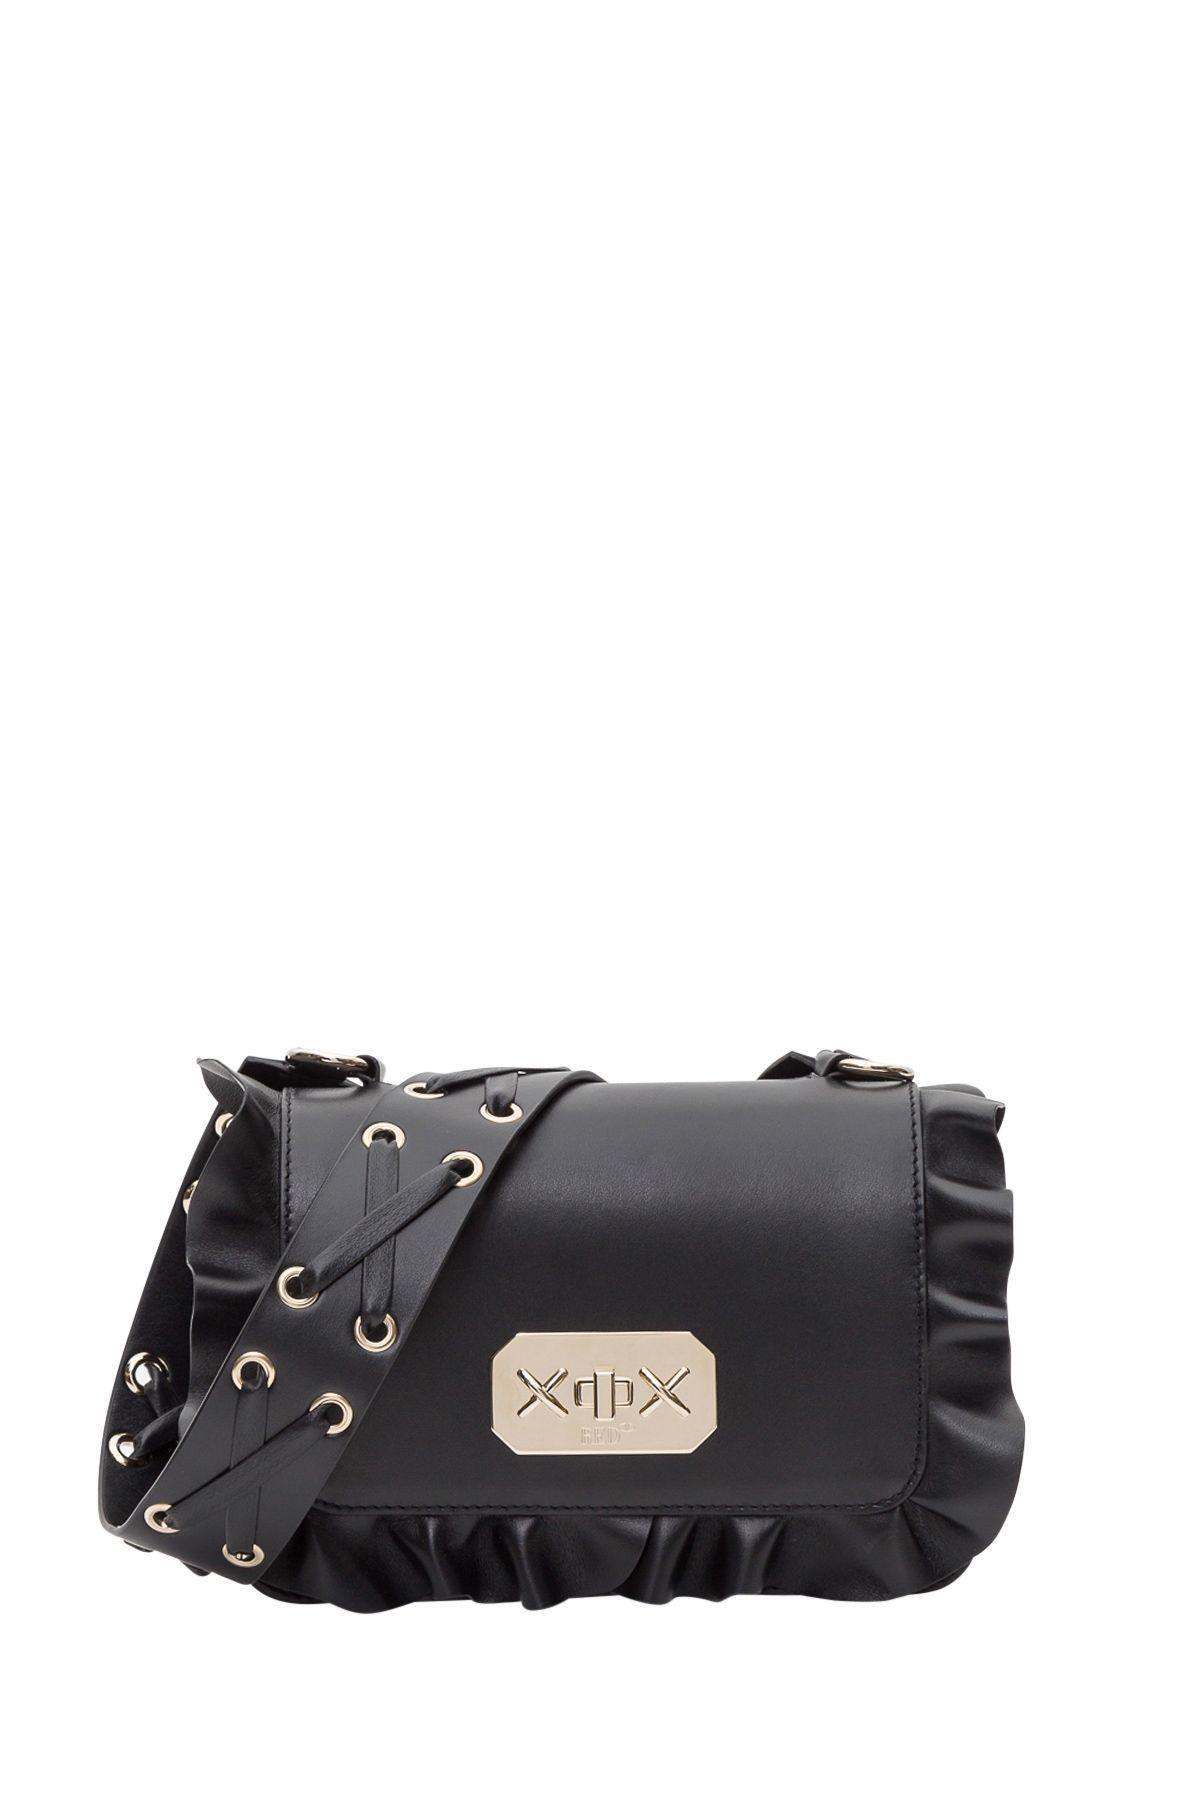 6da8745a19 RED VALENTINO ROCK RUFFLES SHOULDER BAG. #redvalentino #bags #shoulder bags  #leather #lining #cotton